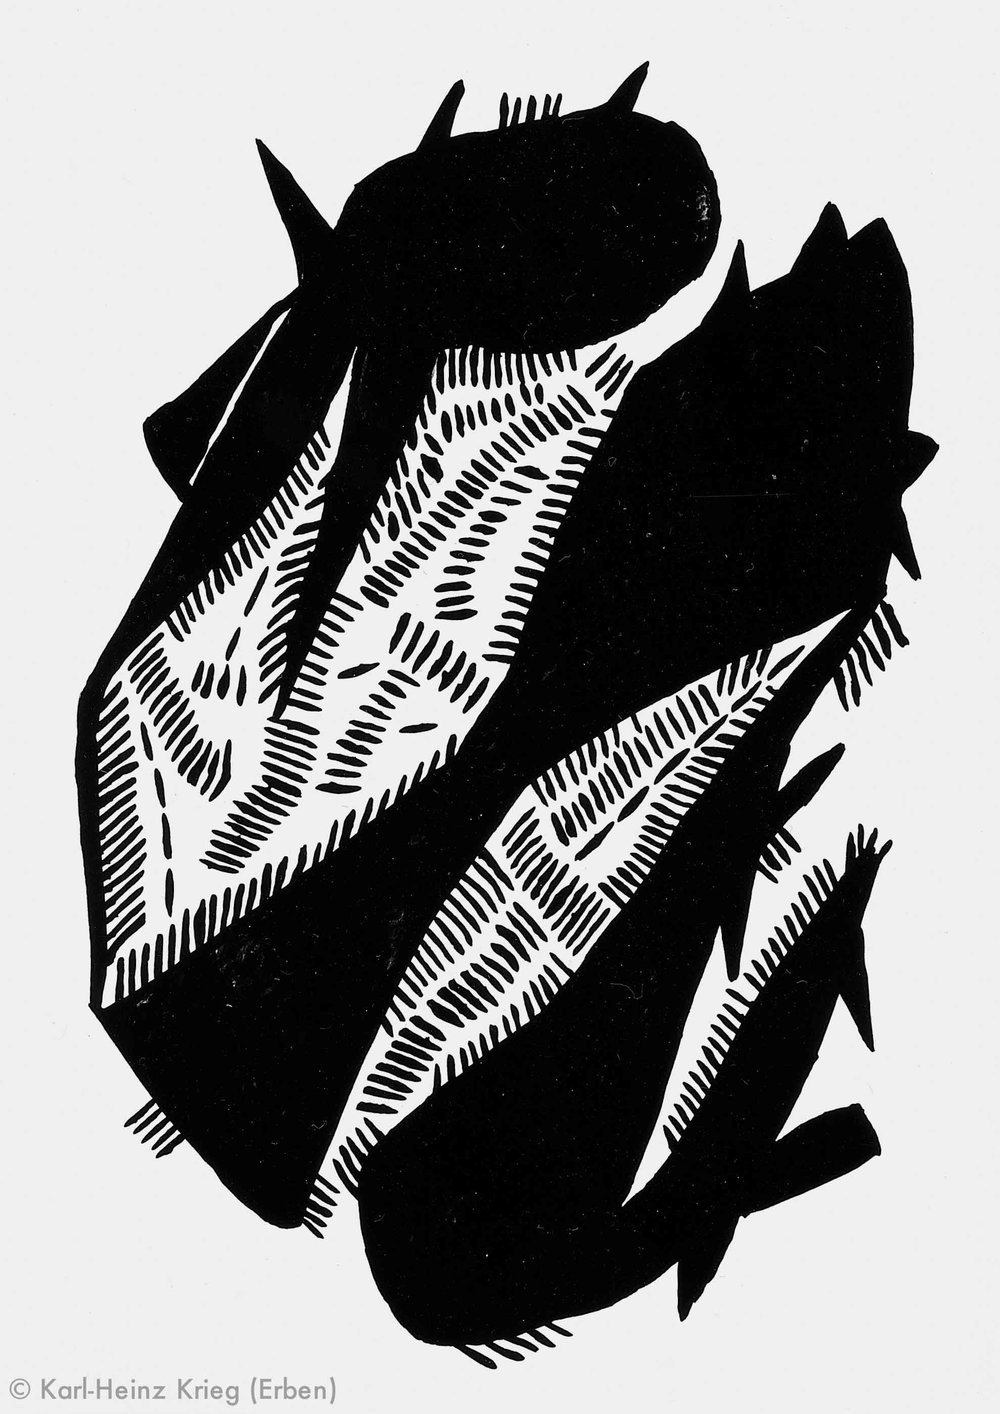 Akoi Zoumanigi Wöéngi, 1996 Acryl/Papier, grundiert 40,8 x 29 cm Werknr. 38-1996/75